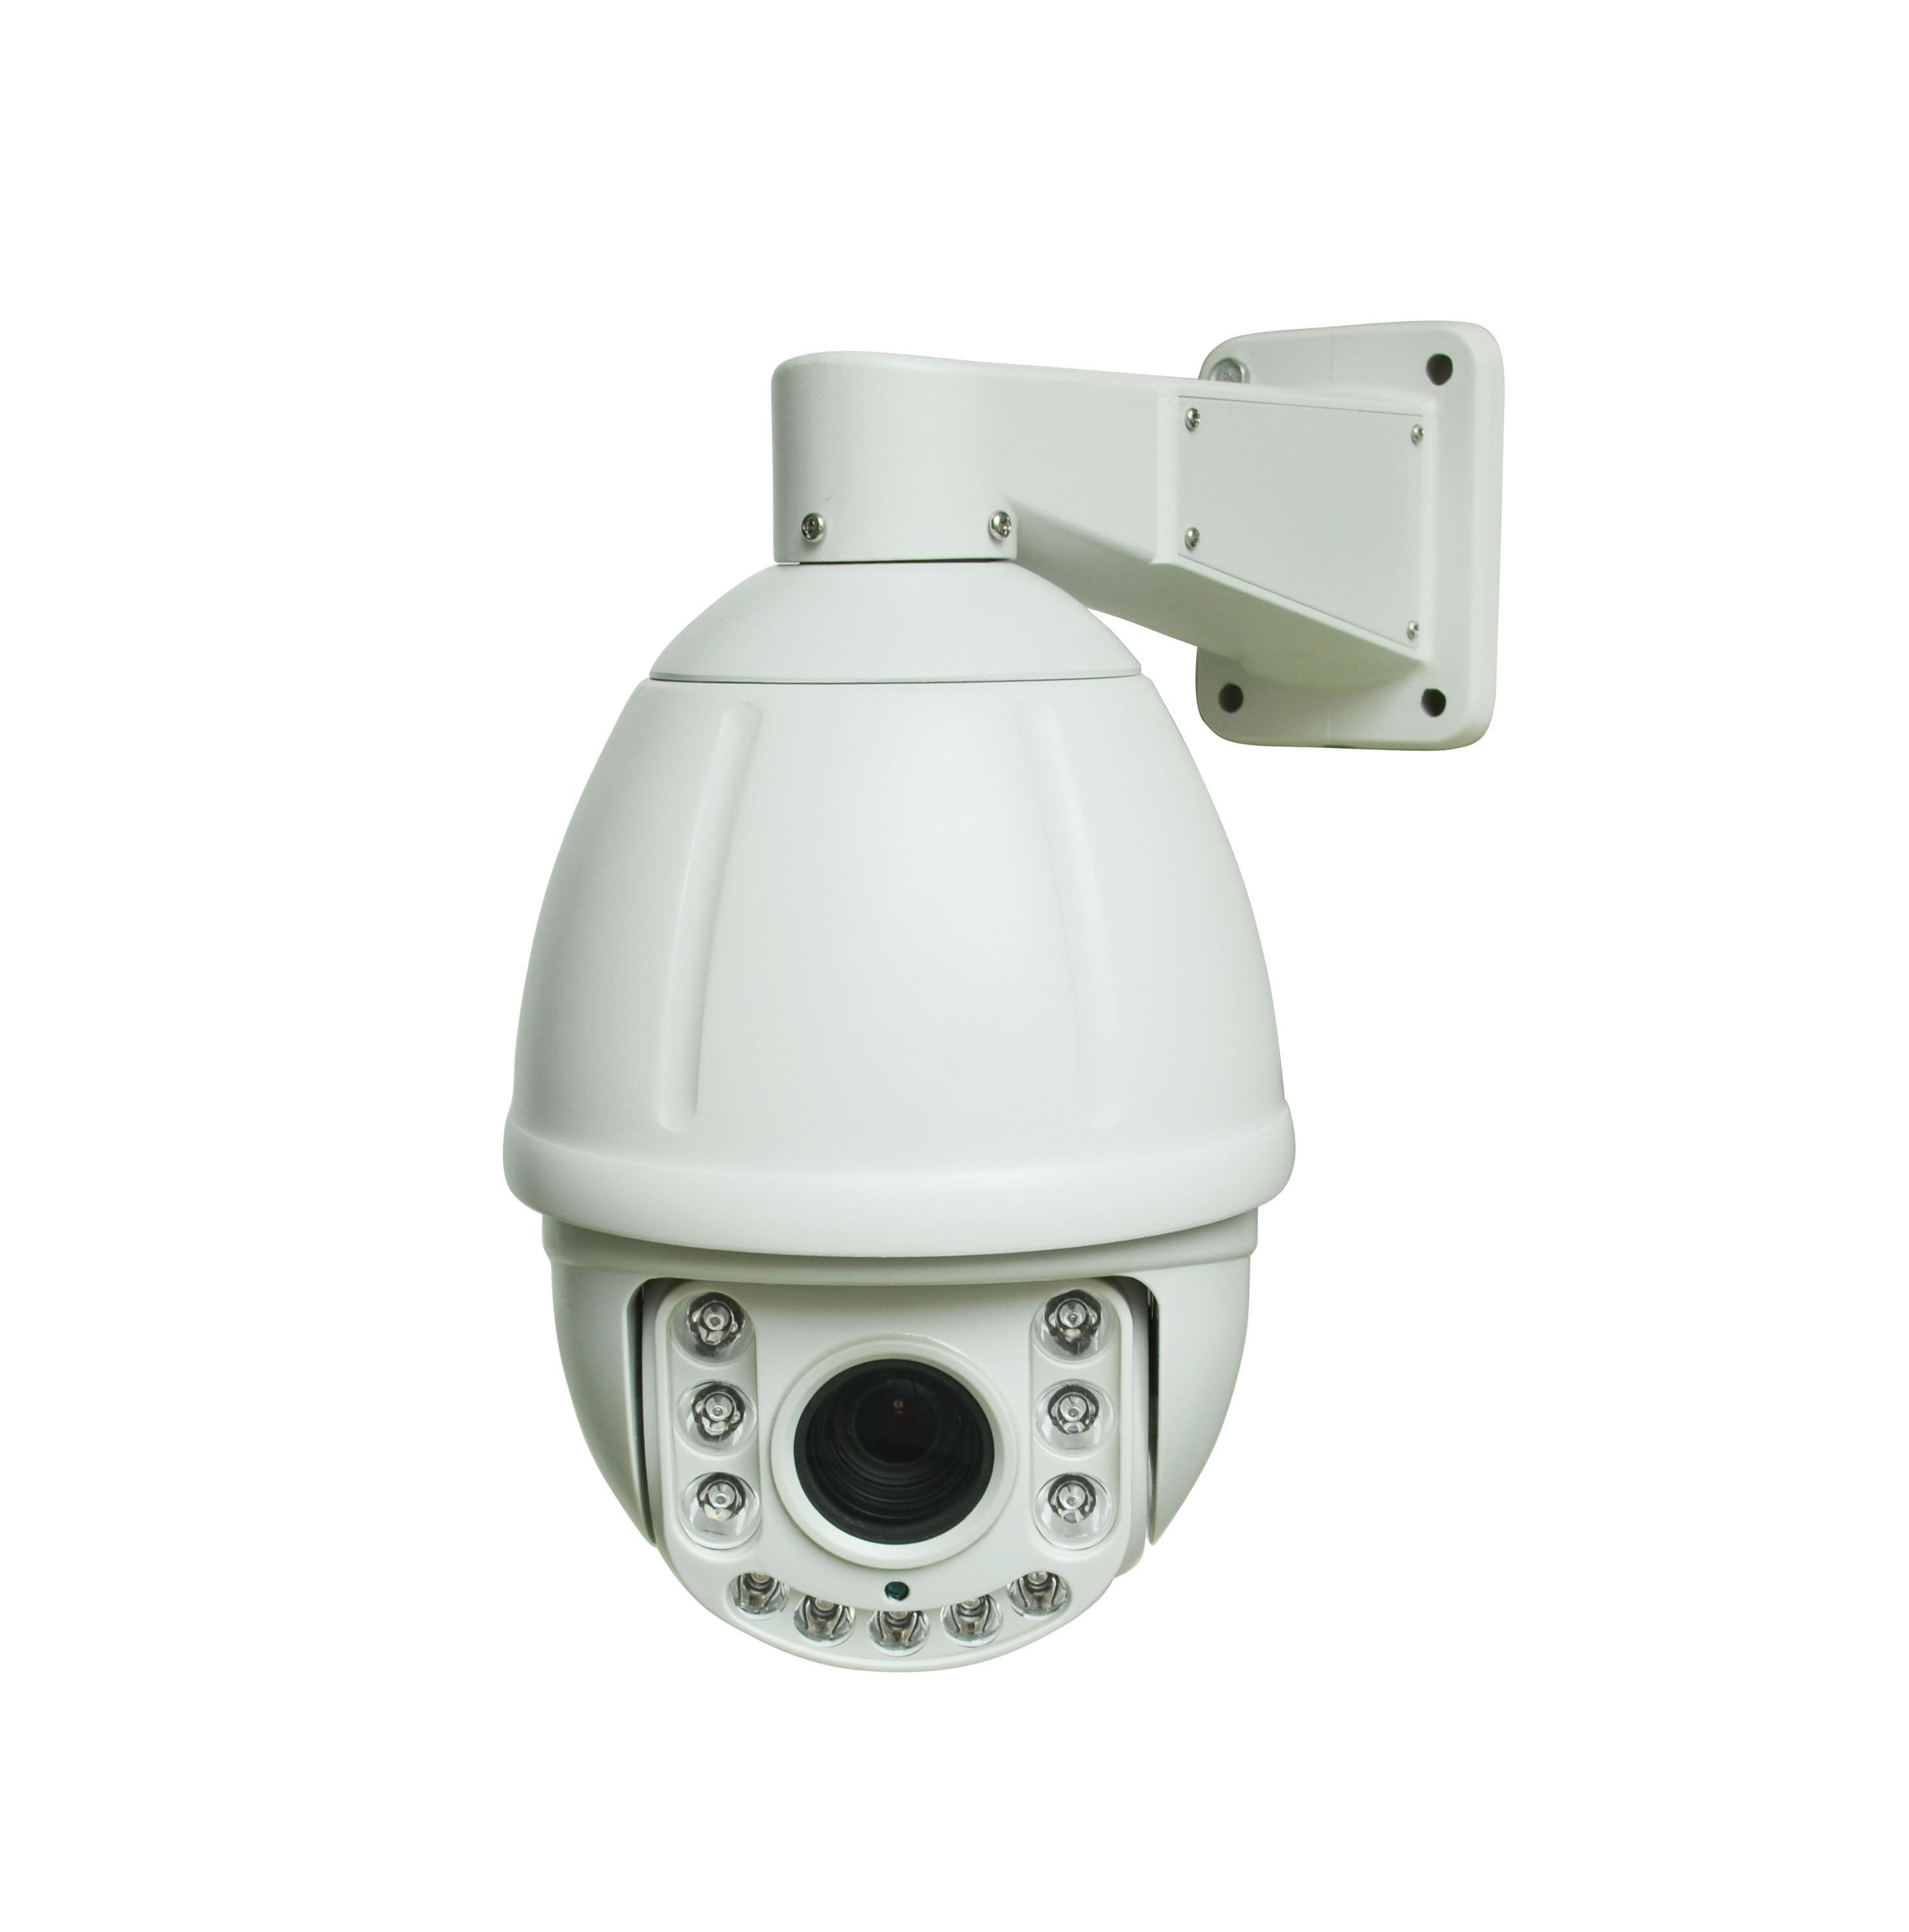 Wired 1,000TVL Indoor/Outdoor IR PTZ Camera with 36X Opti...